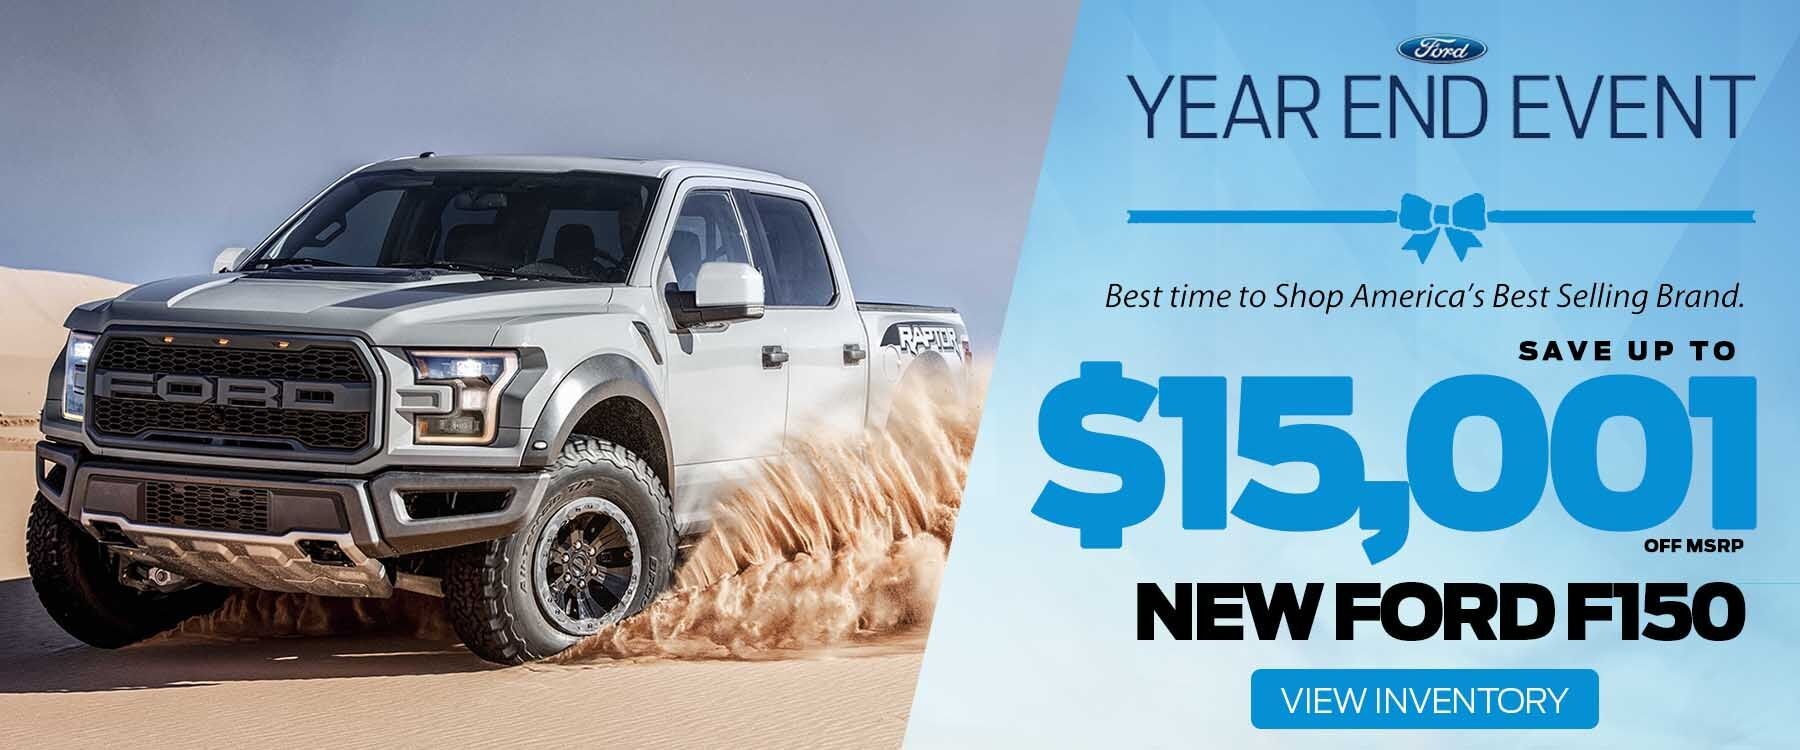 Syncmyride Ford Escape 2014 - takvim kalender HD